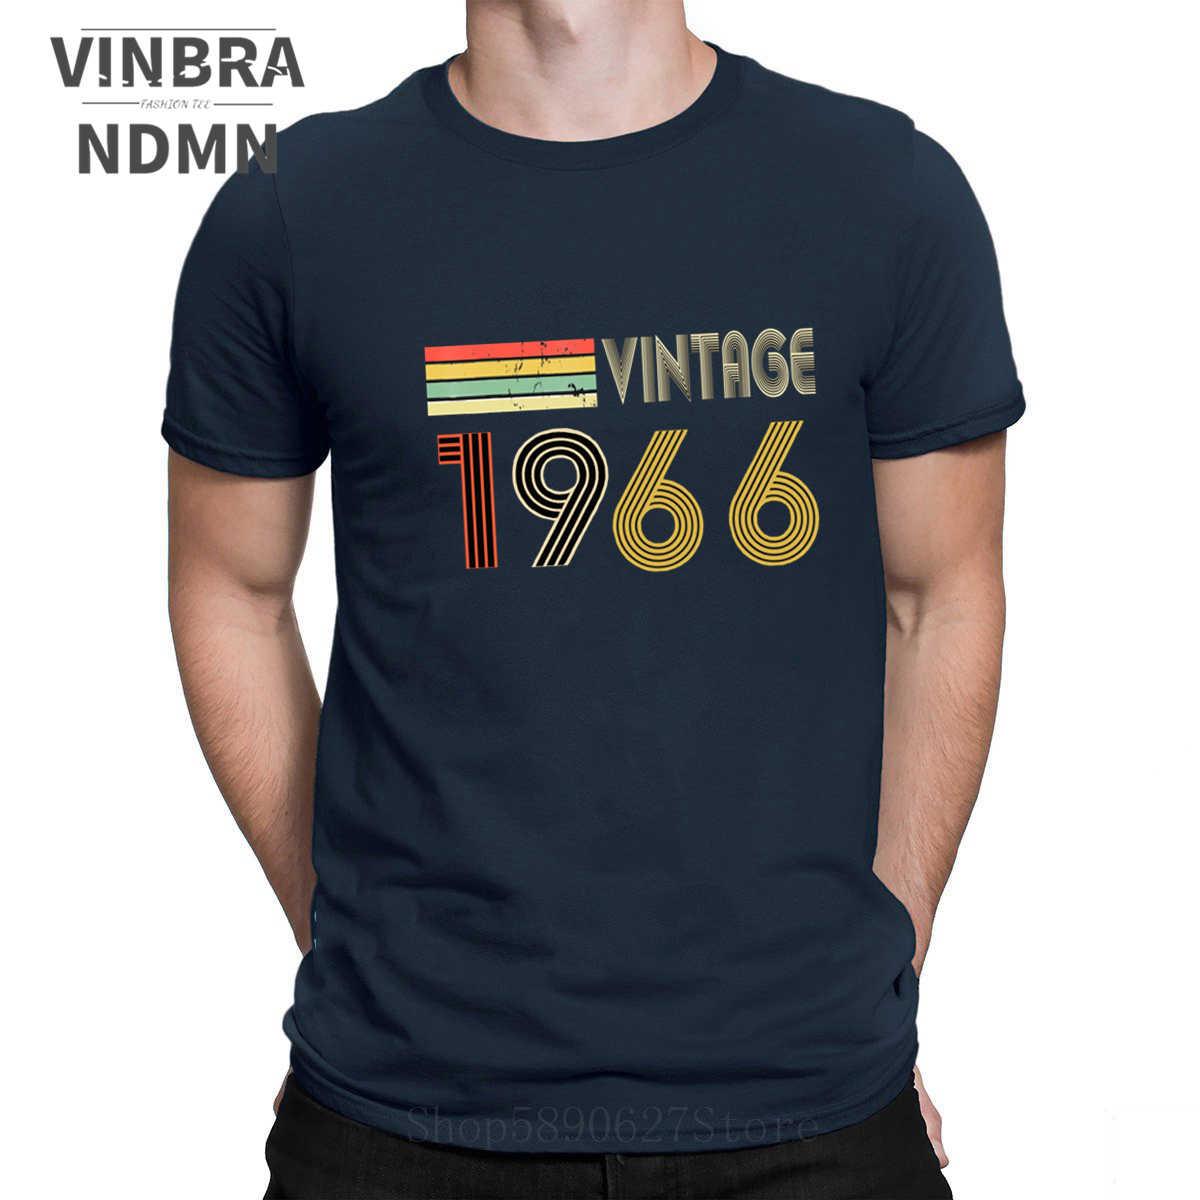 54th Birthday Made In Year 1966 All Original Parts Tshirt Dad Grandad Brother